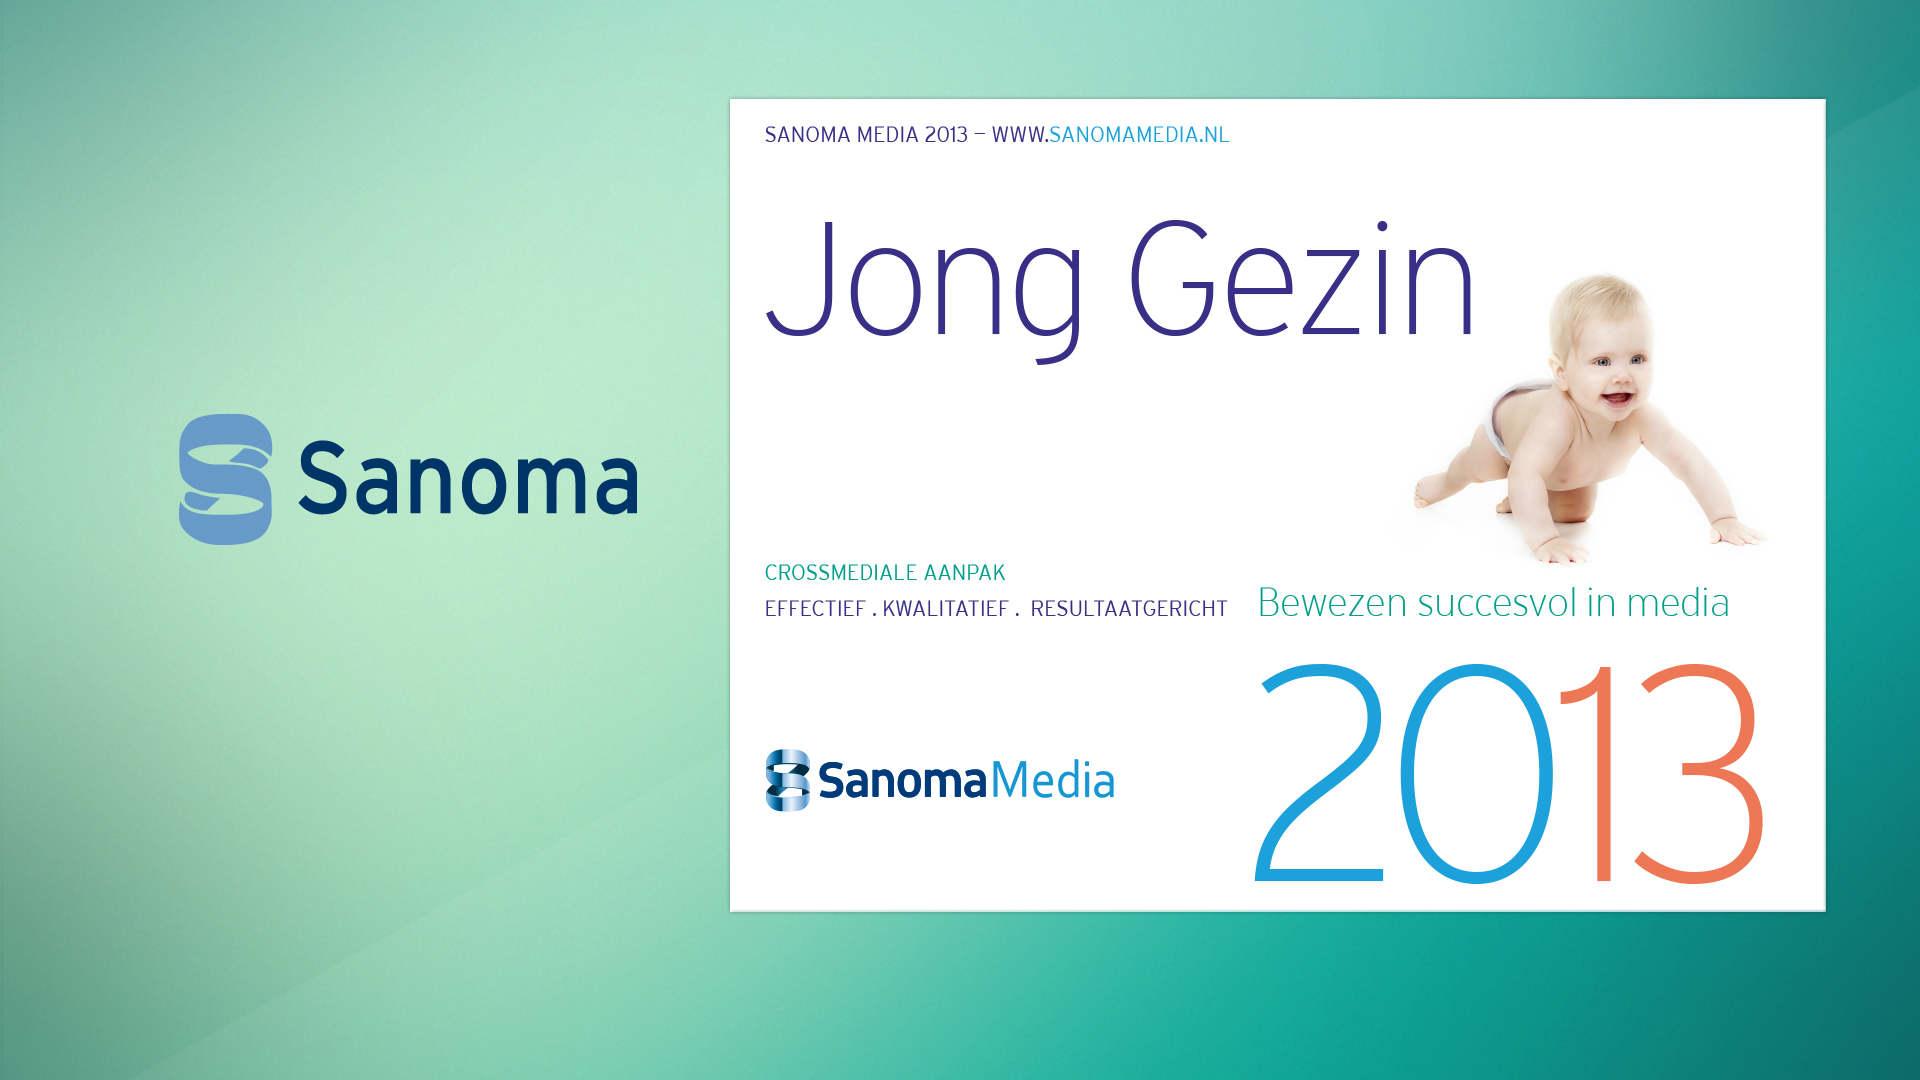 Sanoma - Branding Consultancy - Sham Ramessar